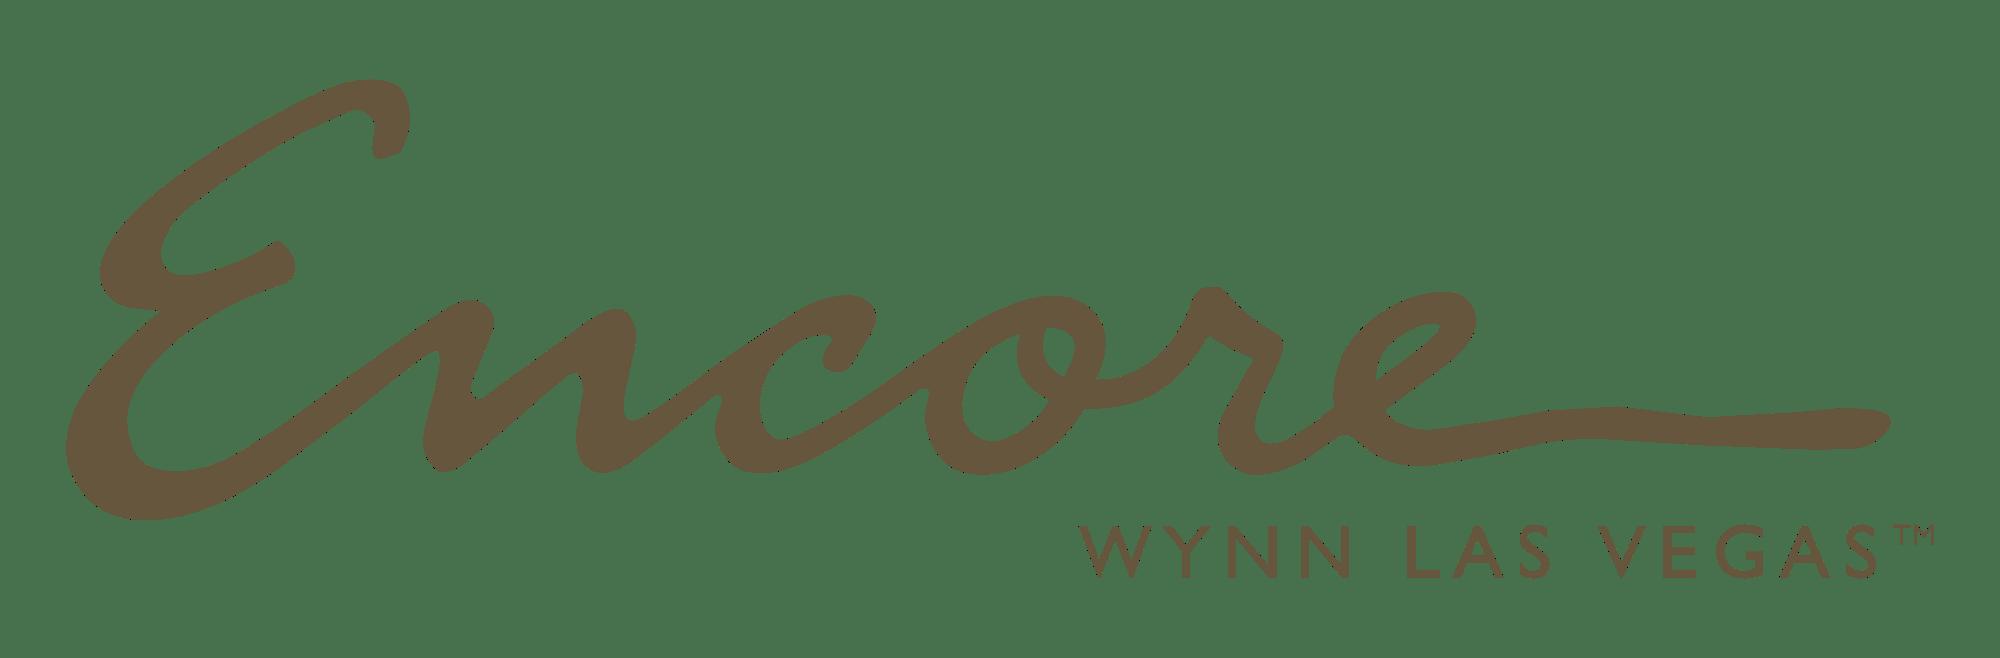 Encore wynn las vegas. Logo clipart hotel